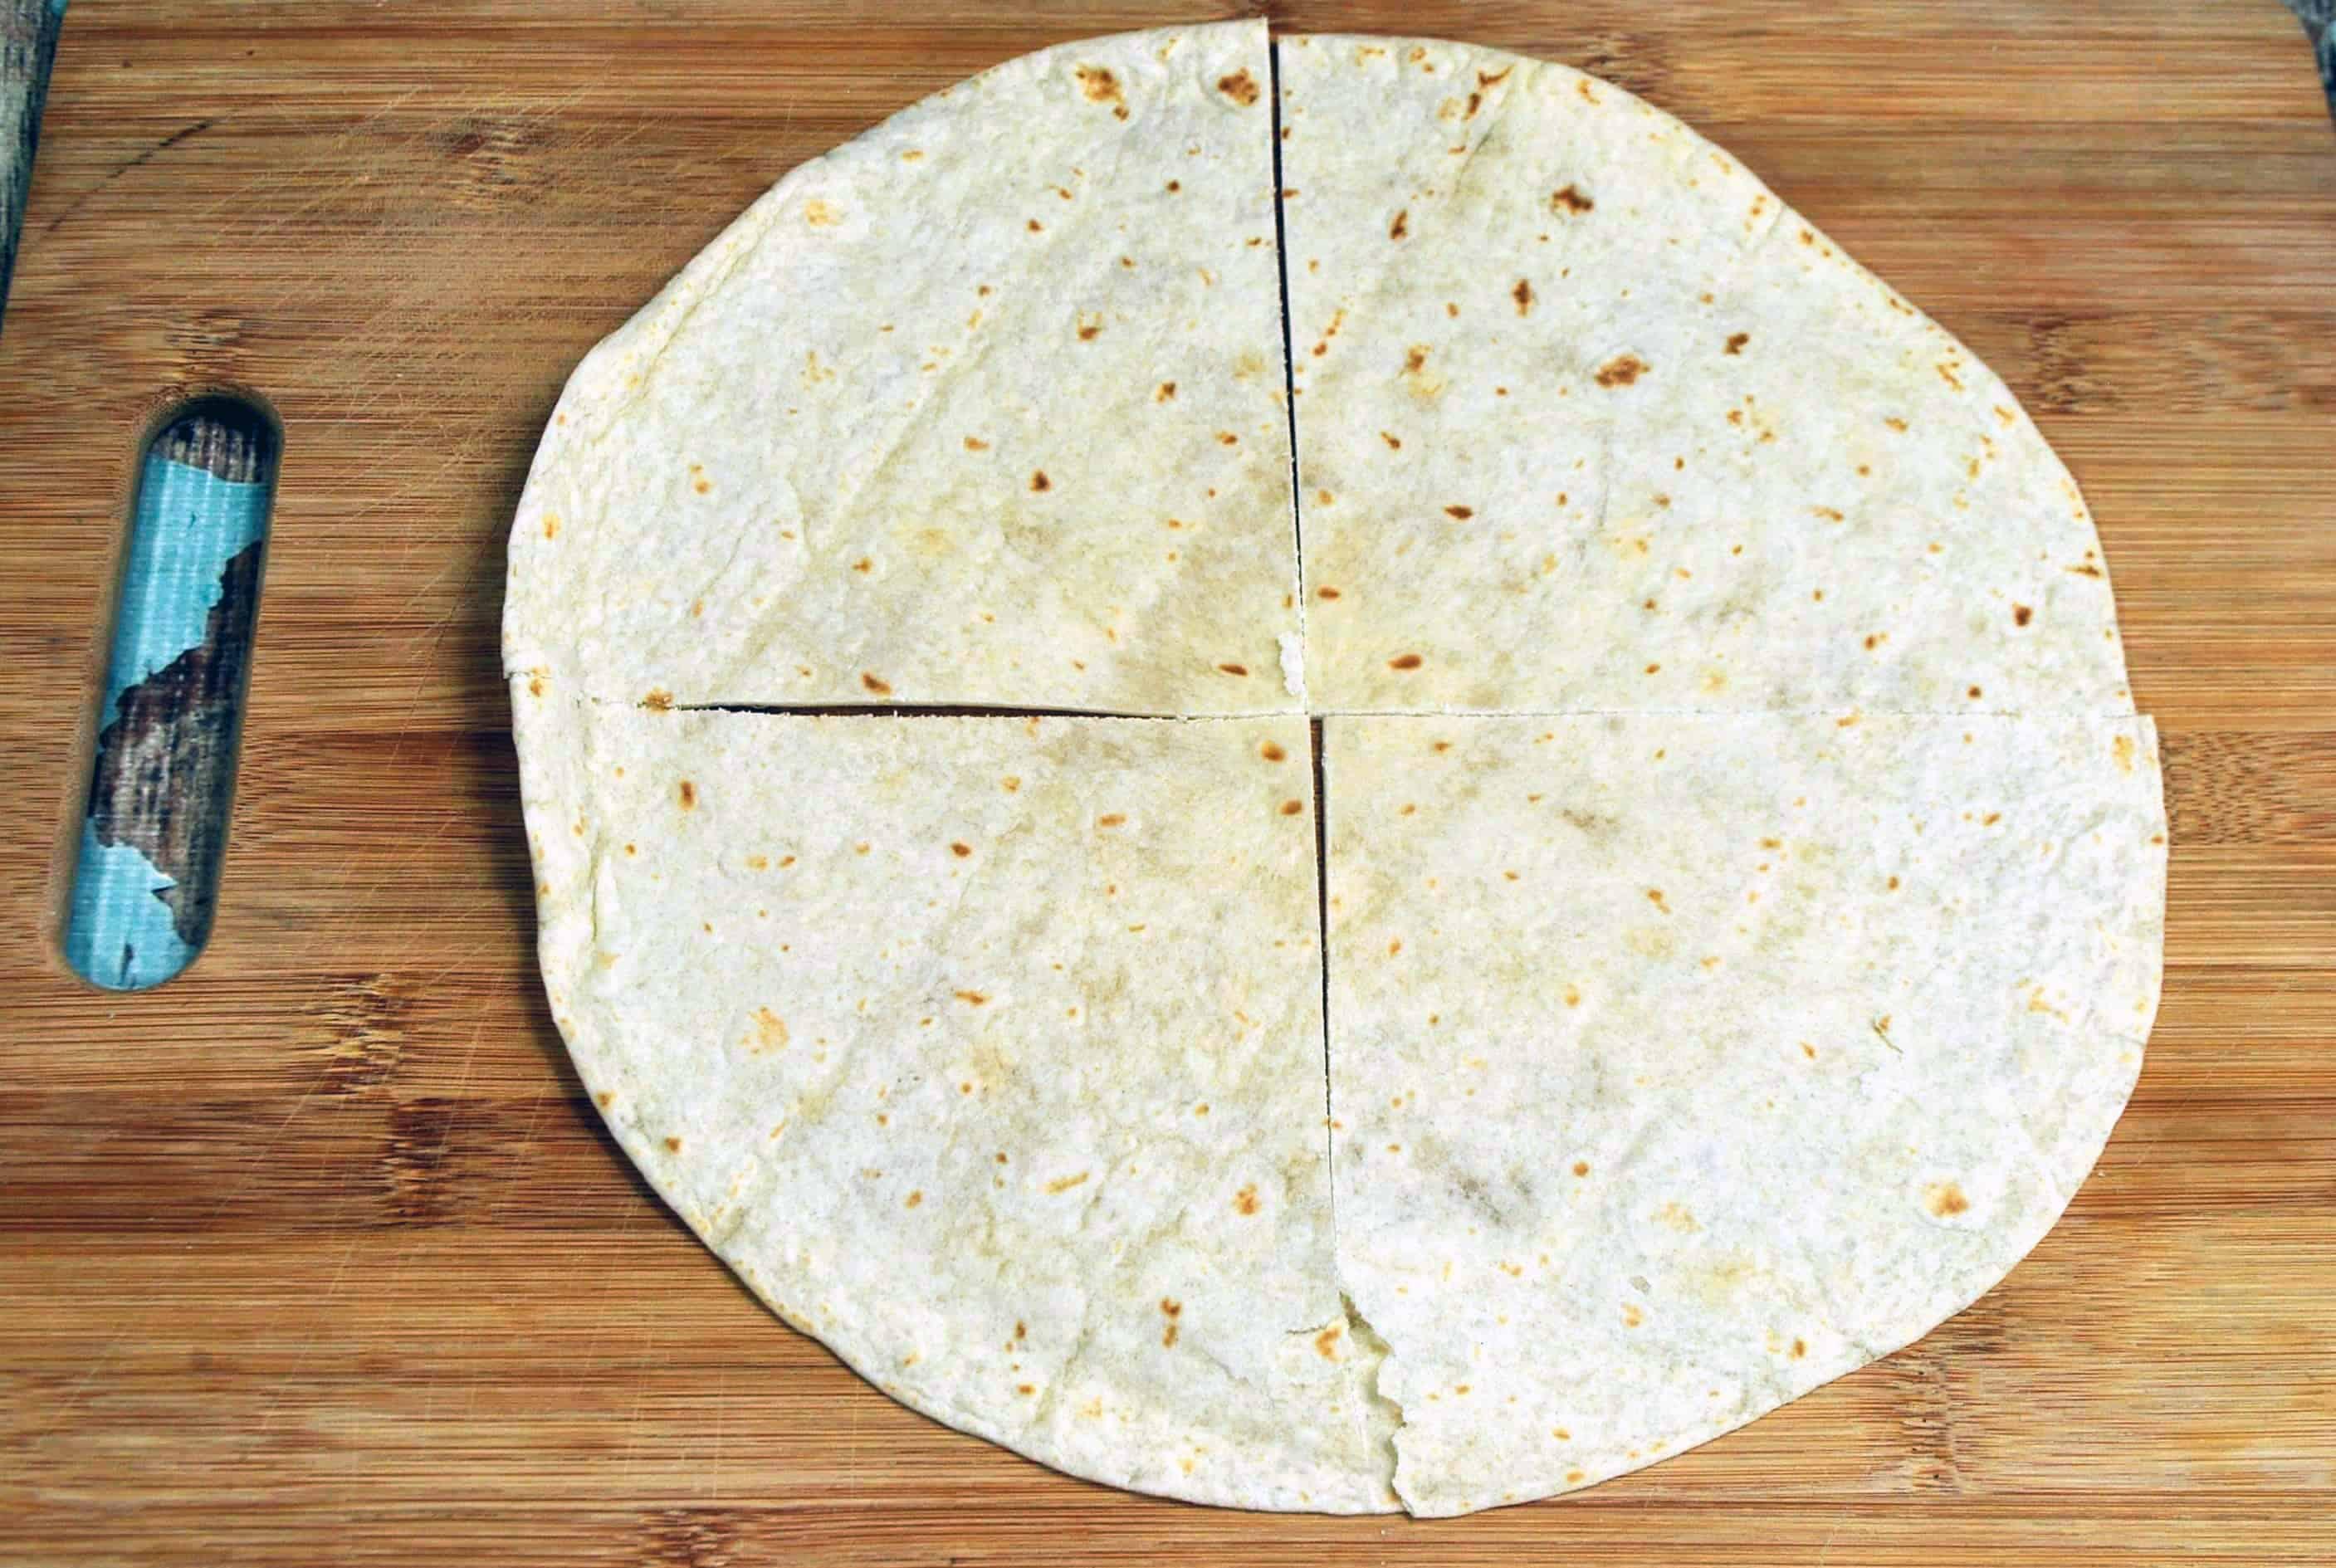 cut the tortilla into 4 pieces